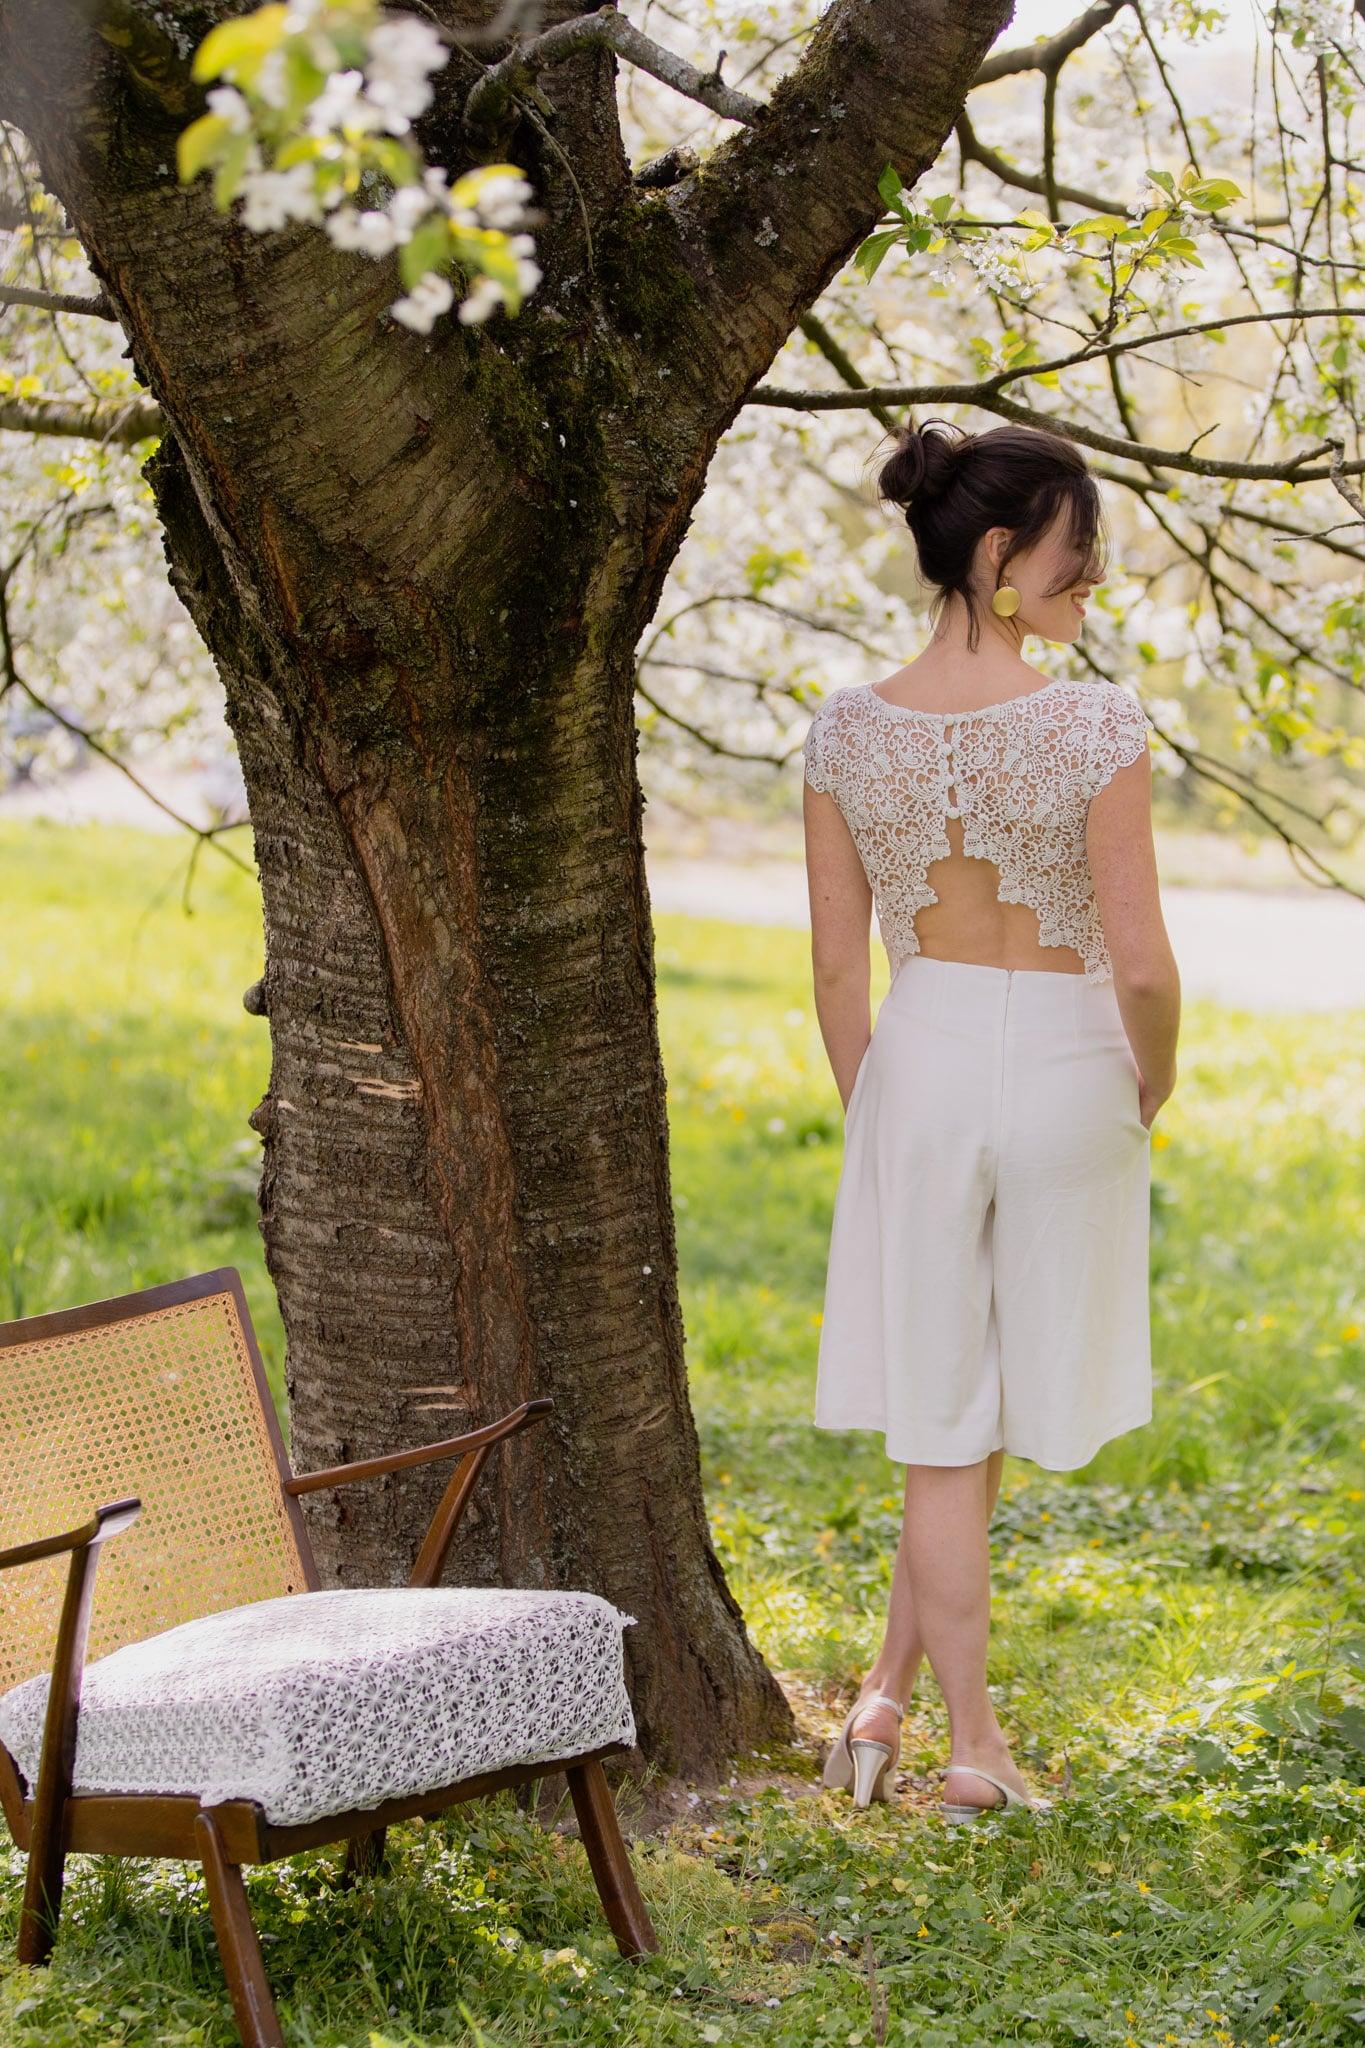 Magnolia Claudia Heller Modedesign Brautkombination – gesehen bei frauimmer-herrewig.de